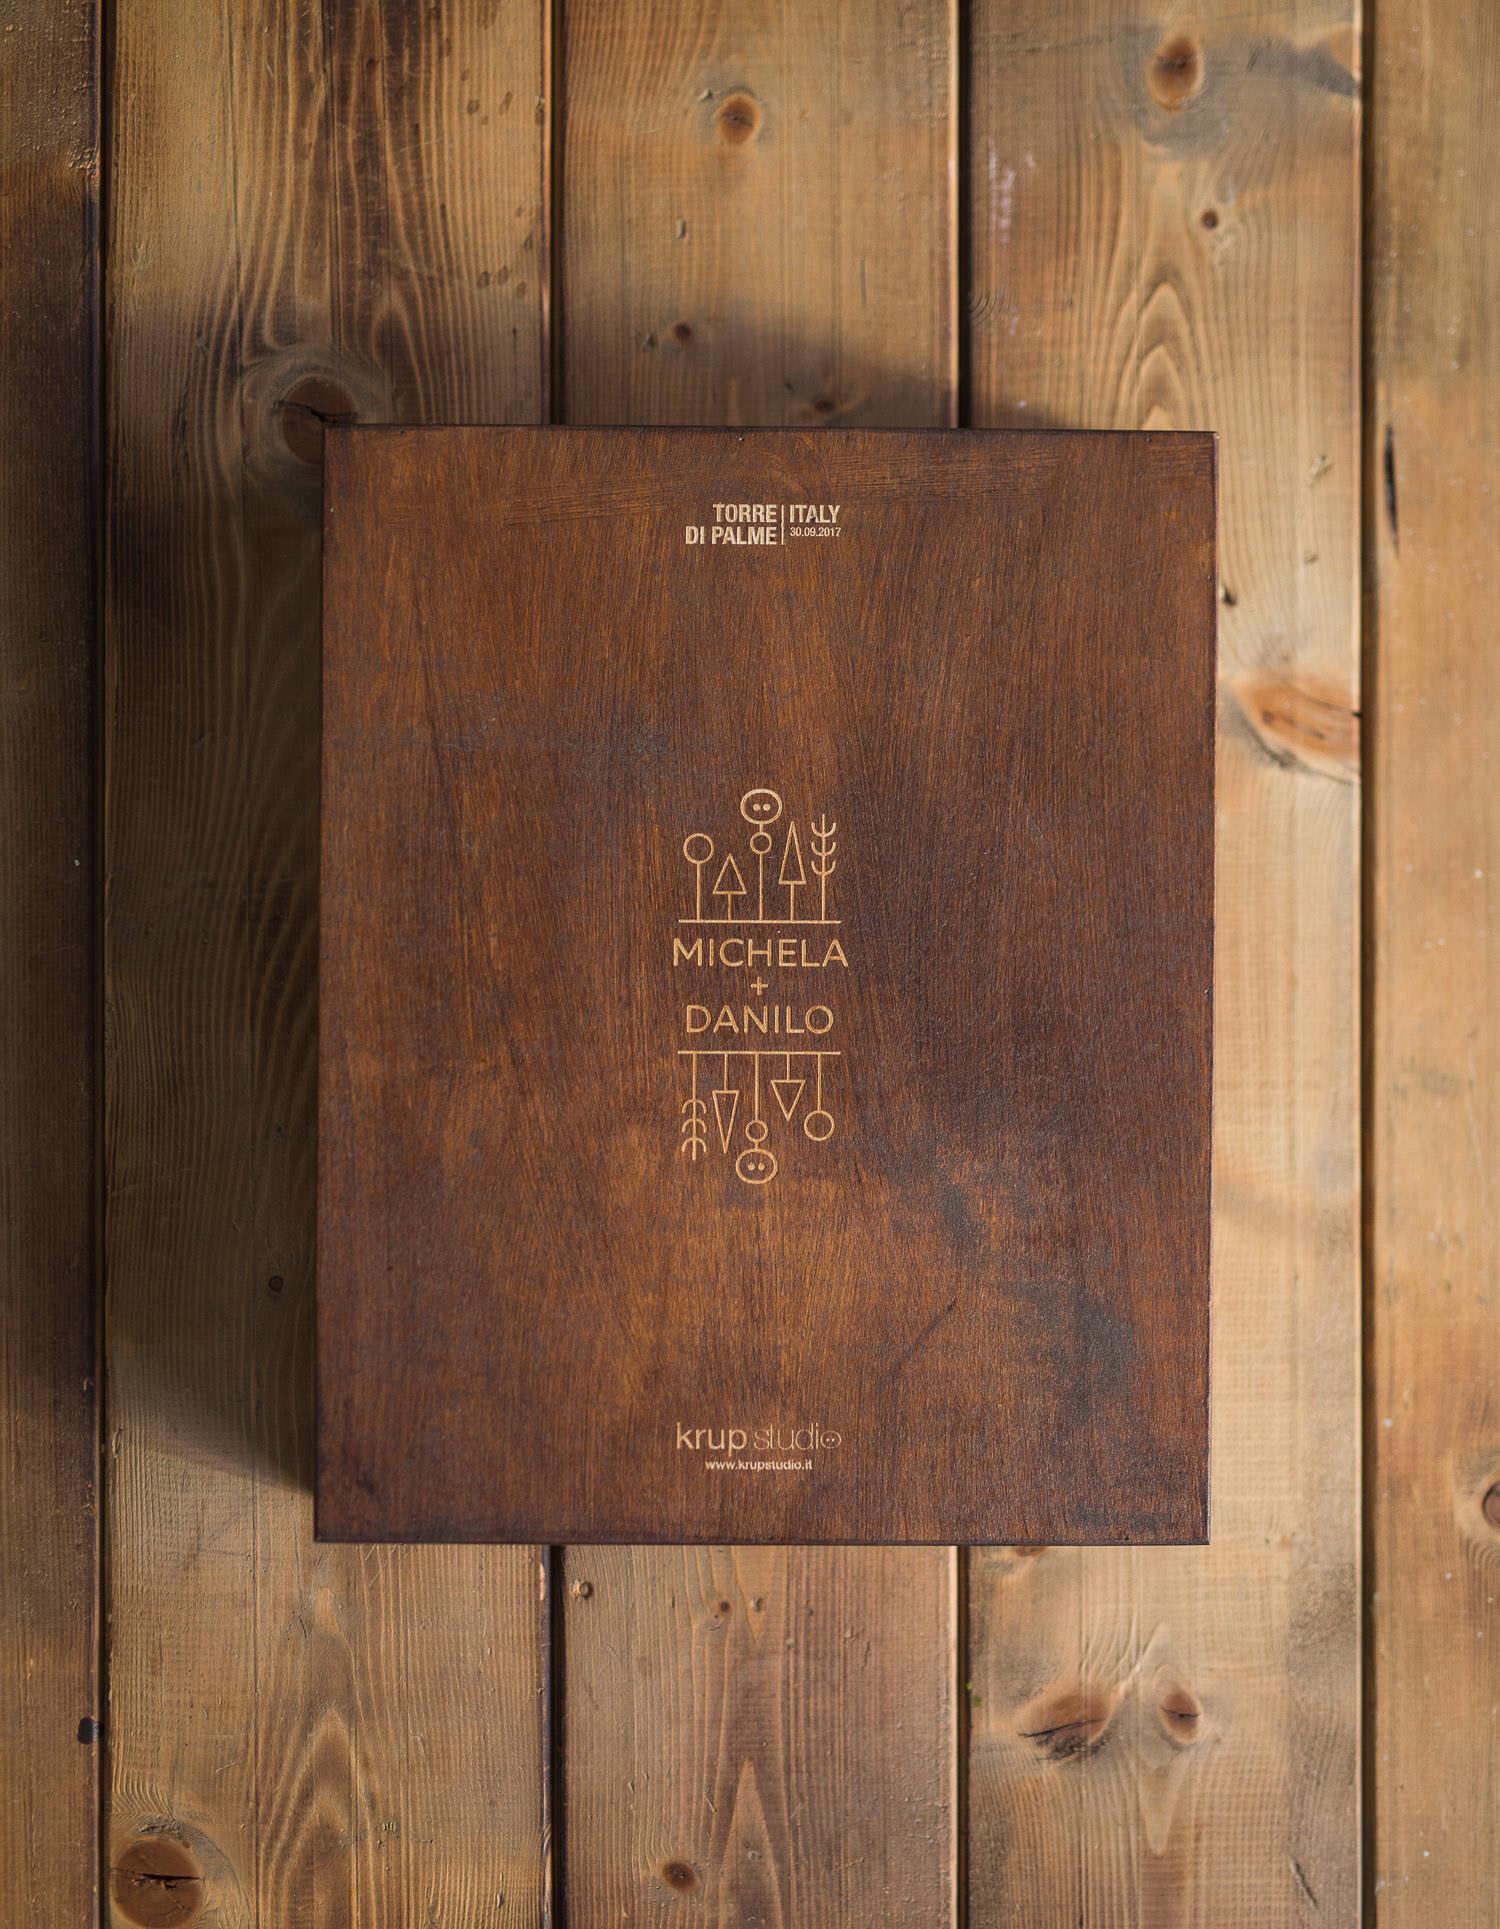 wedding packaging and handcrafetd album